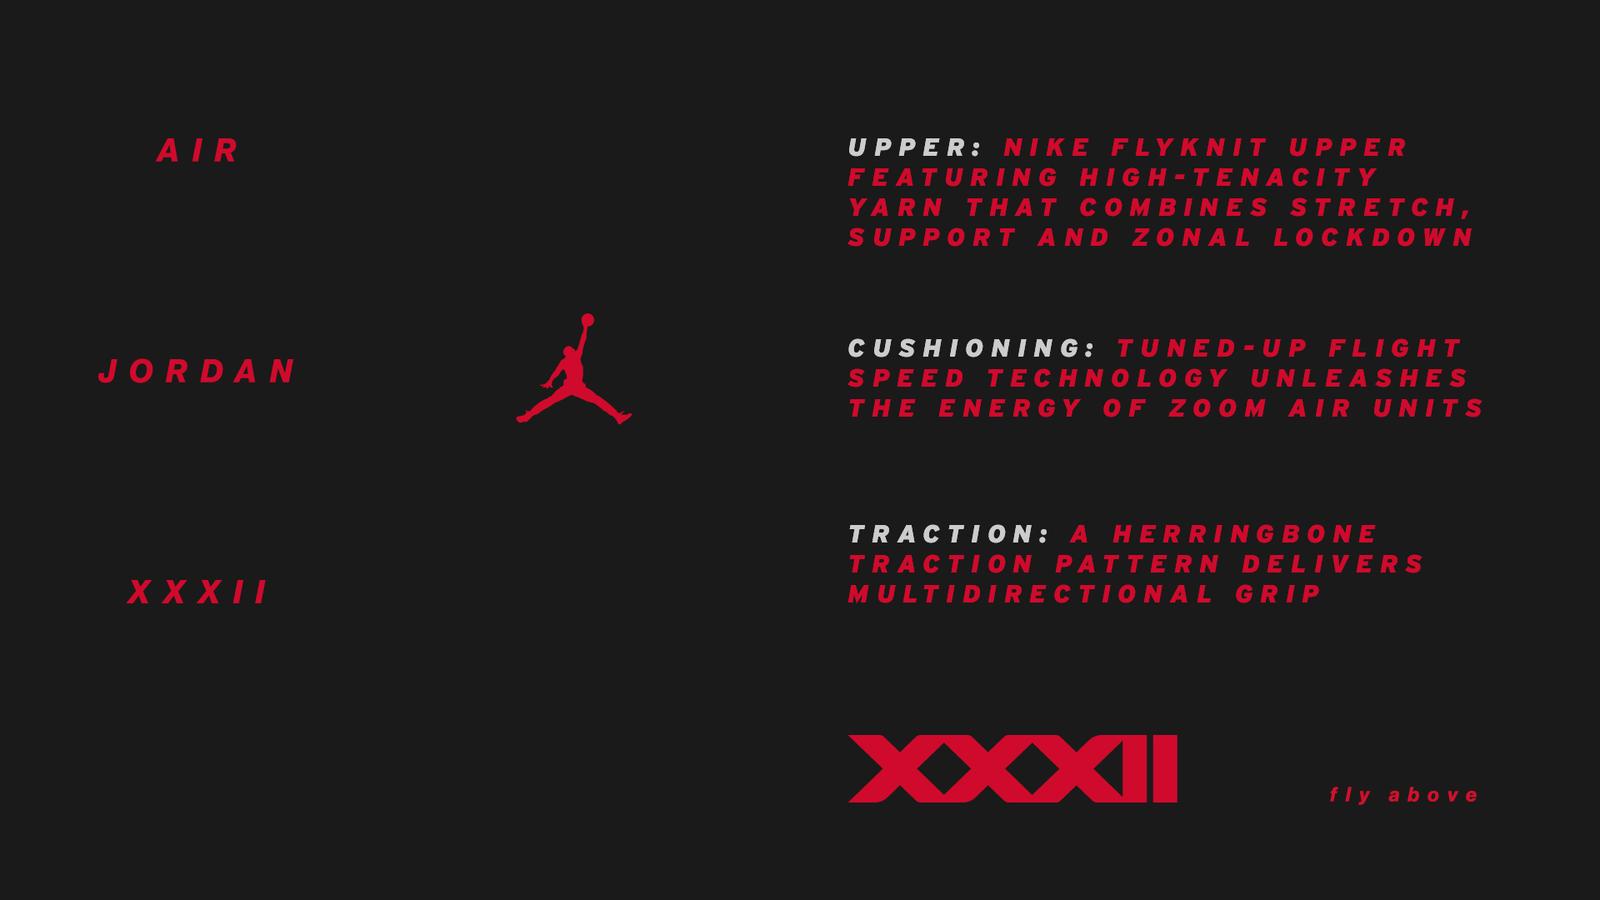 NikeNews_JordanXXXII_02-02_native_1600.jpg